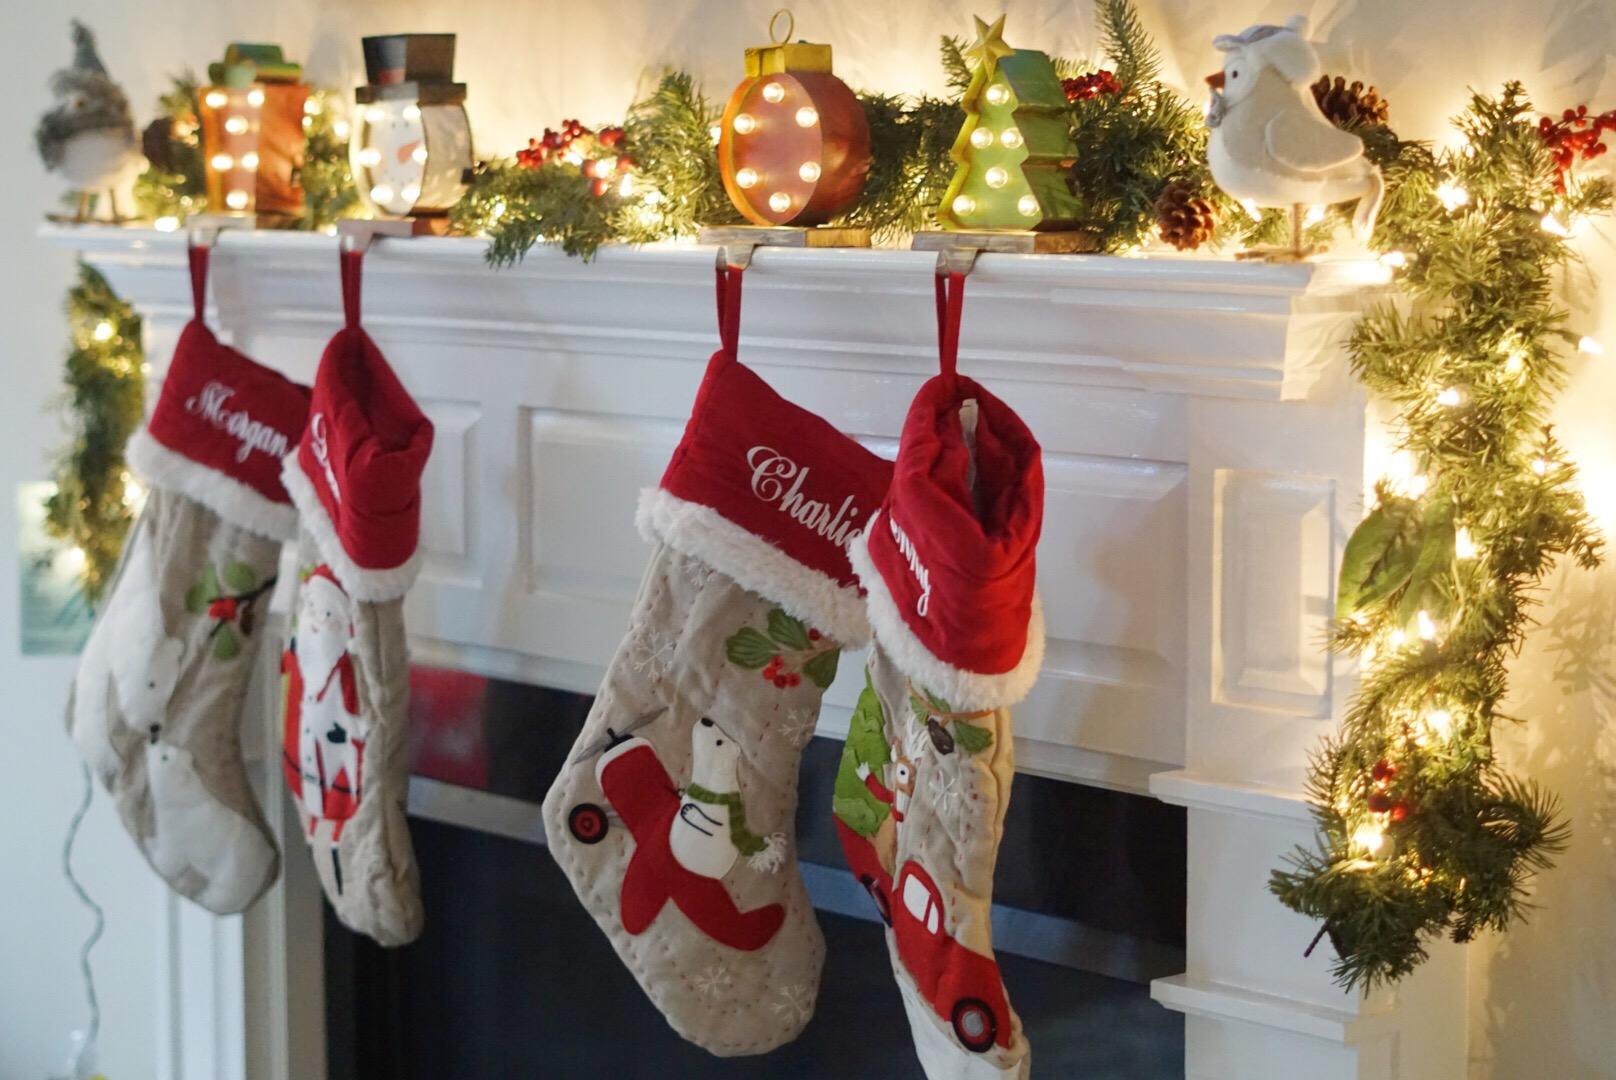 room harrison barn pictures closet devotee home stockings jersey barnes nice interior door barns lighting christmas pottery dining